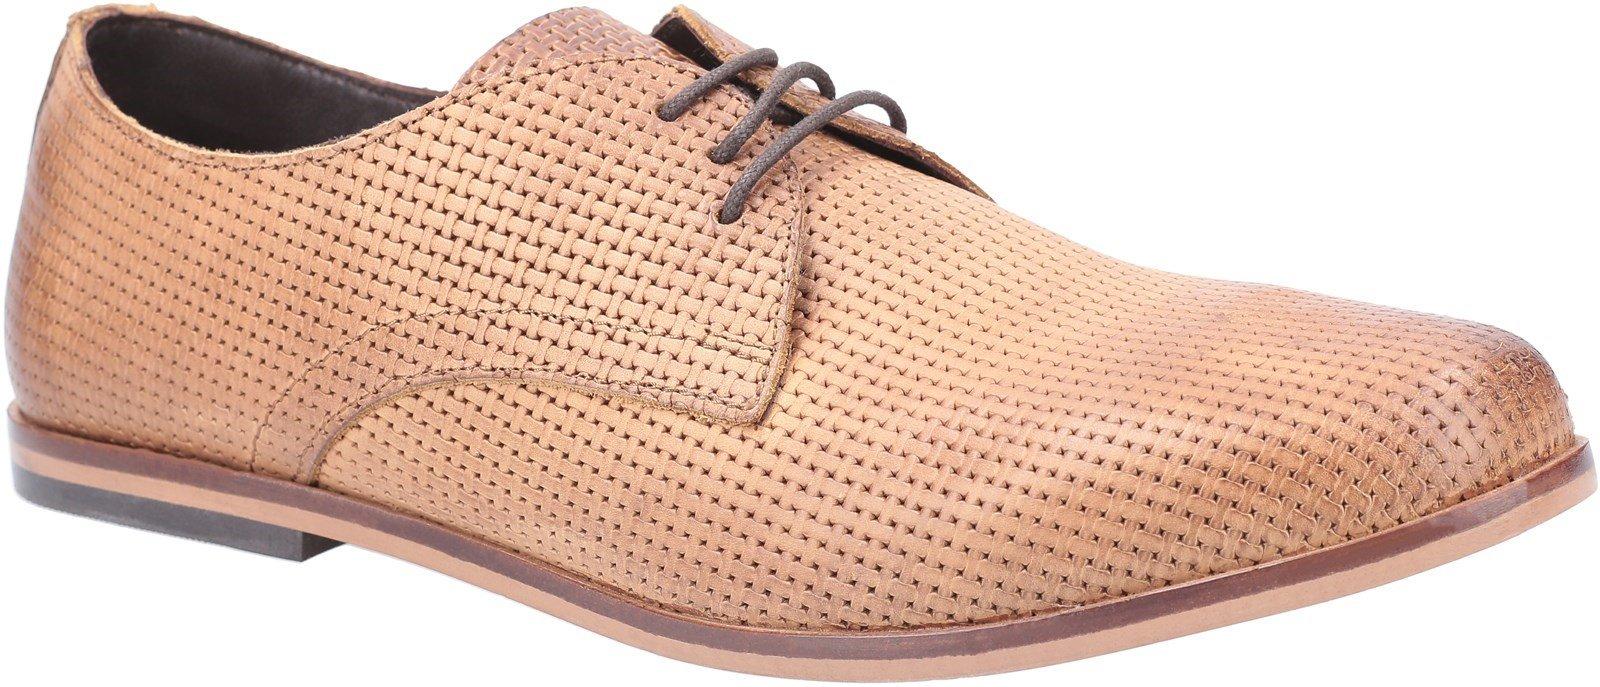 Base London Men's Senna Embos Oxford Shoe Various Colours 30464 - Tan 6